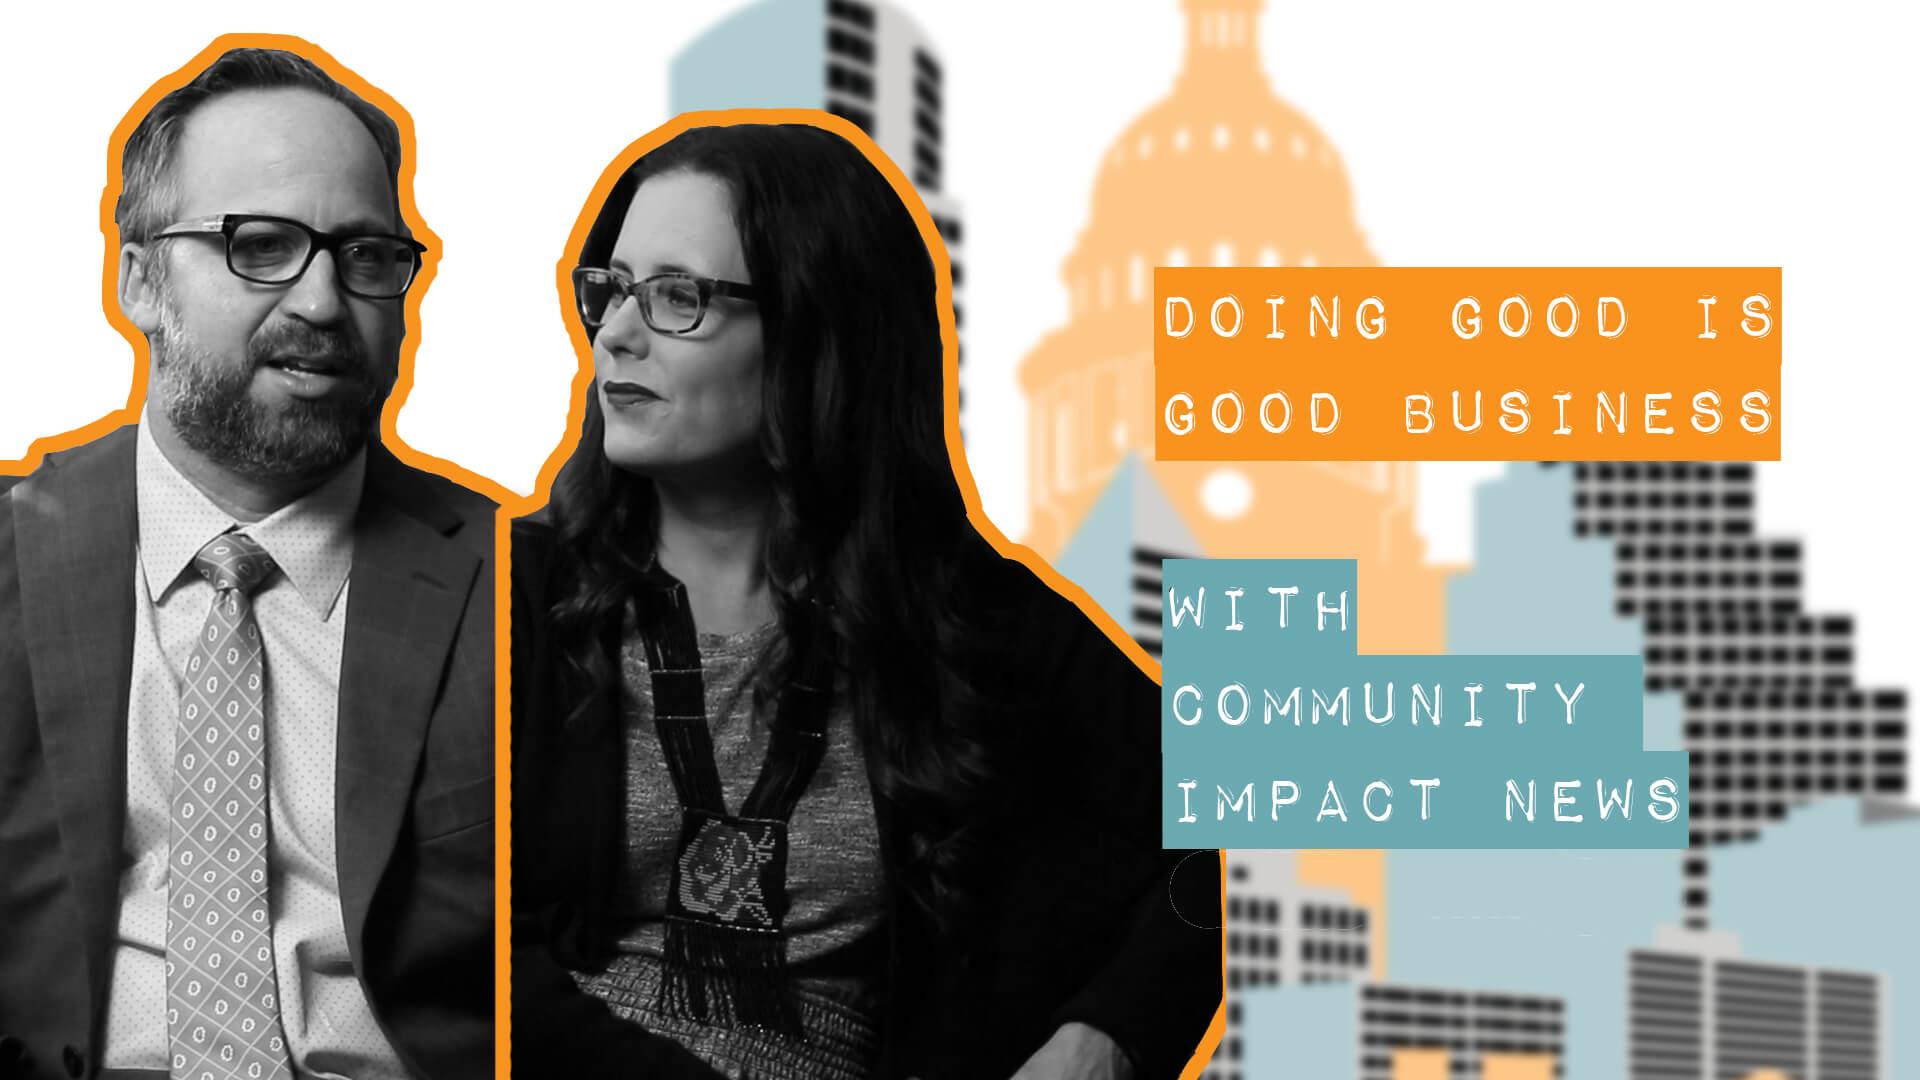 John and Jennifer Garrett: Doing Good is Good Business